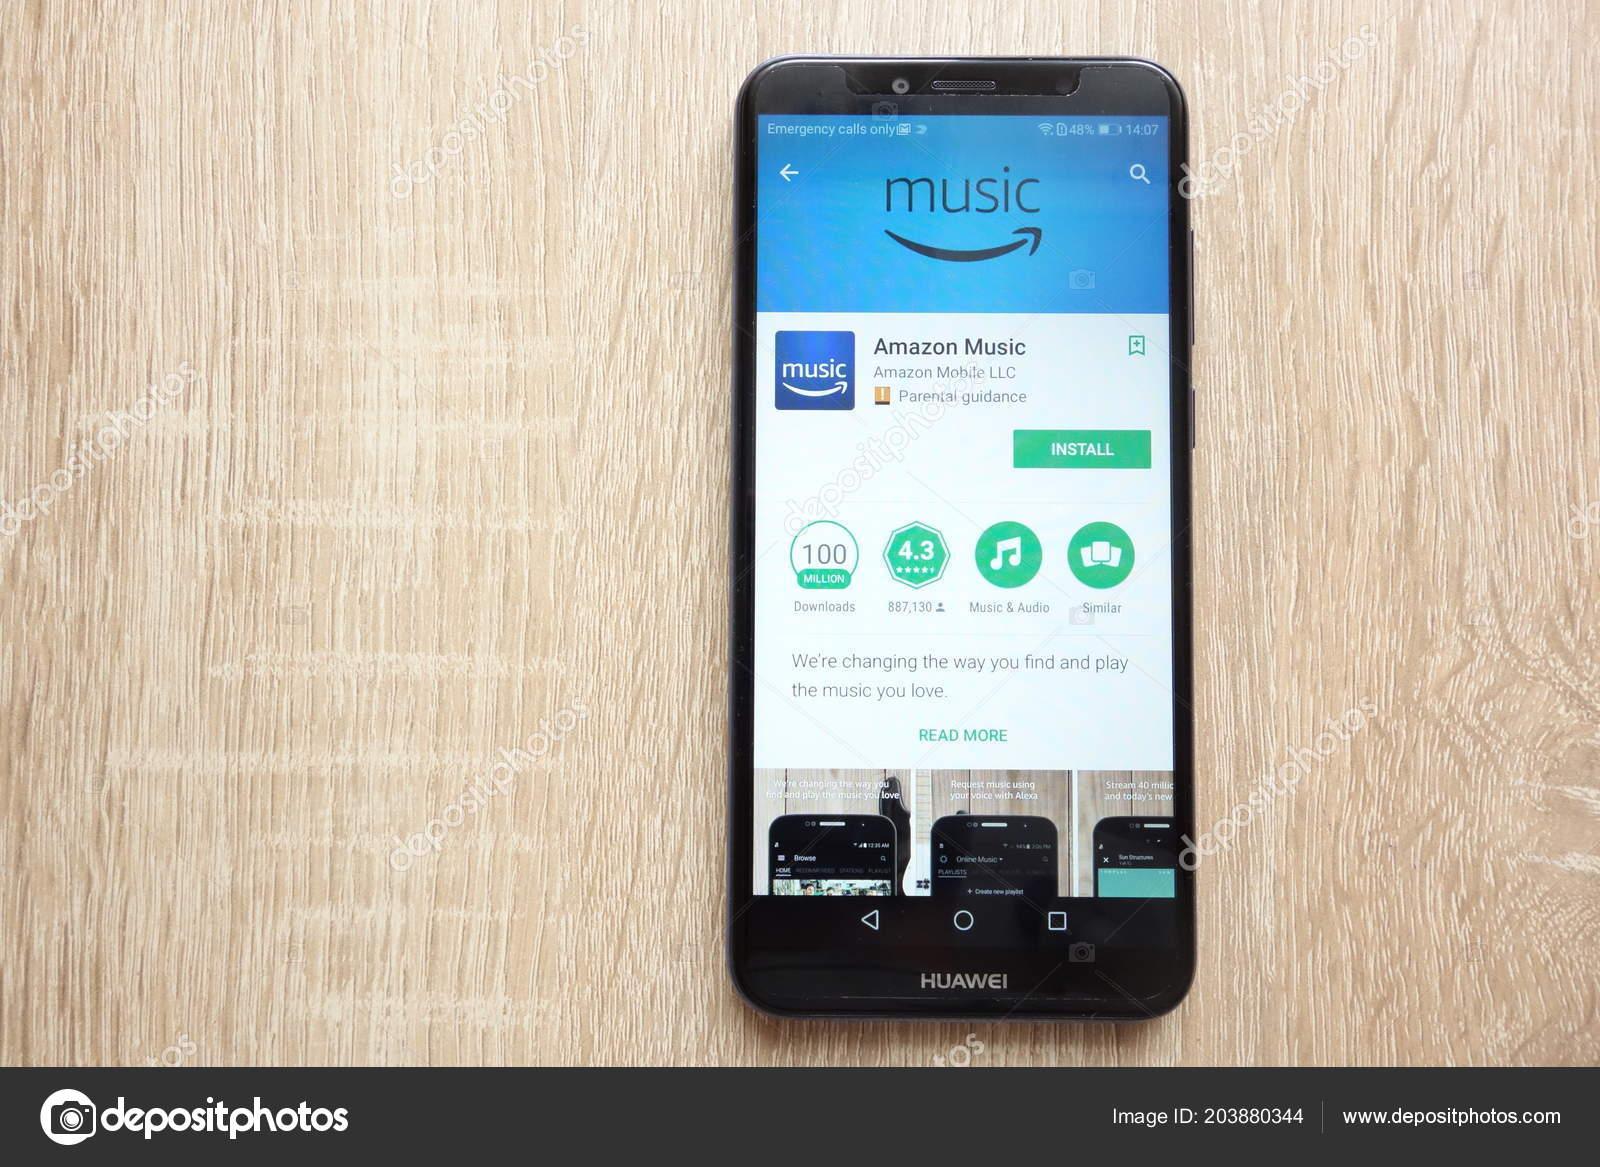 Konskie Poland June 2018 Amazon Music App Google Play Store – Stock